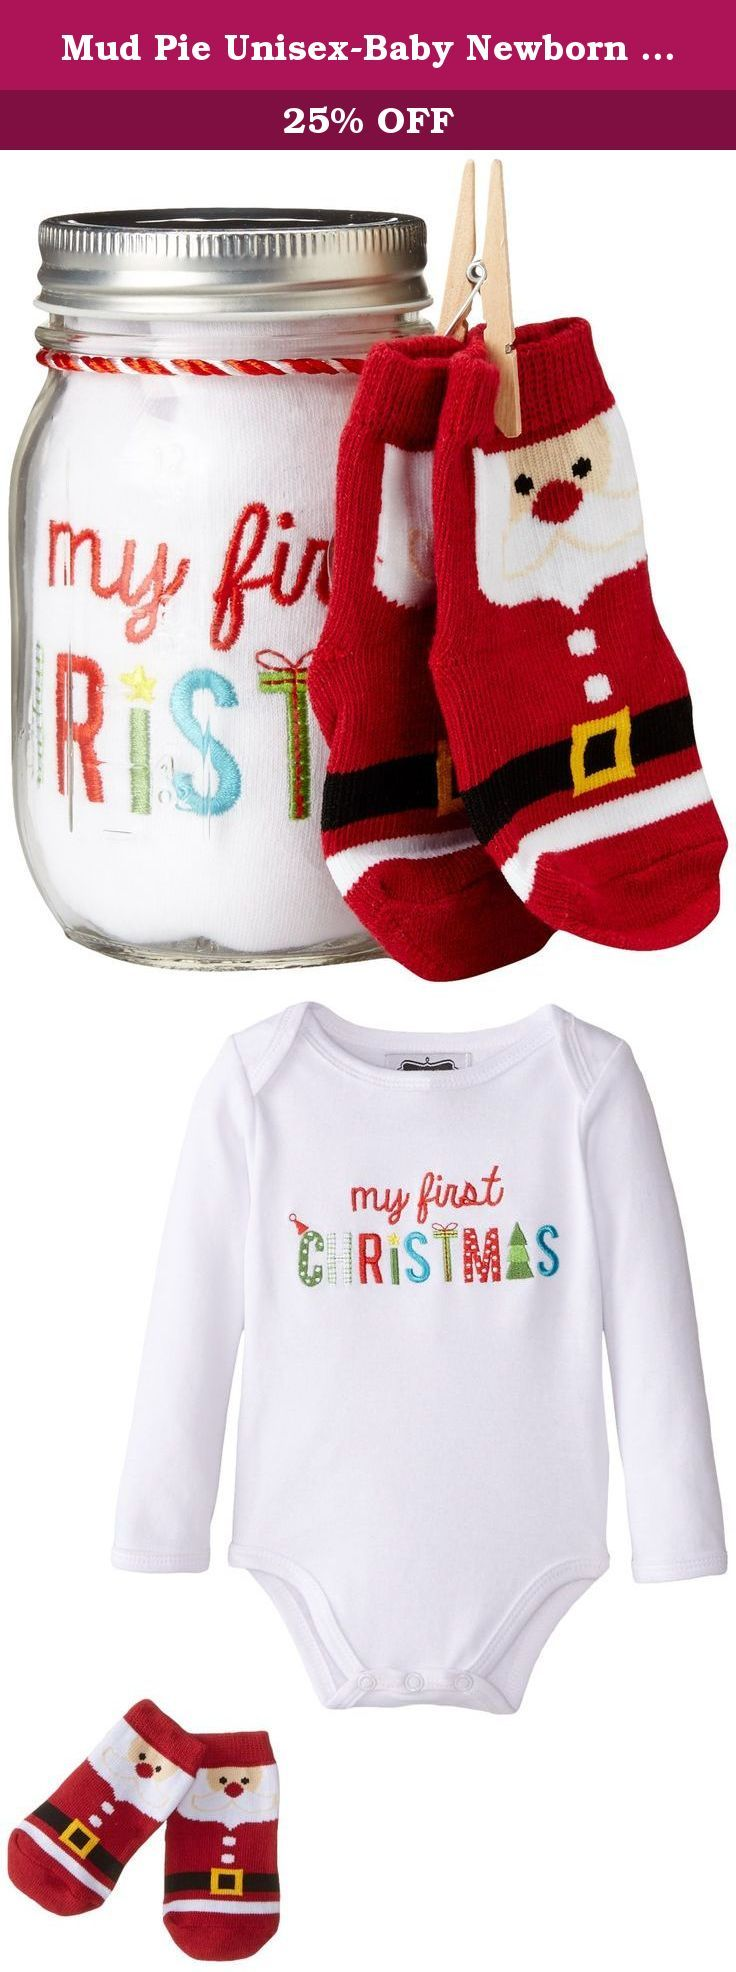 554e283d50b Mud Pie Unisex-Baby Newborn My First Christmas Embroidered Crawler and  Socks Mason Jar Set